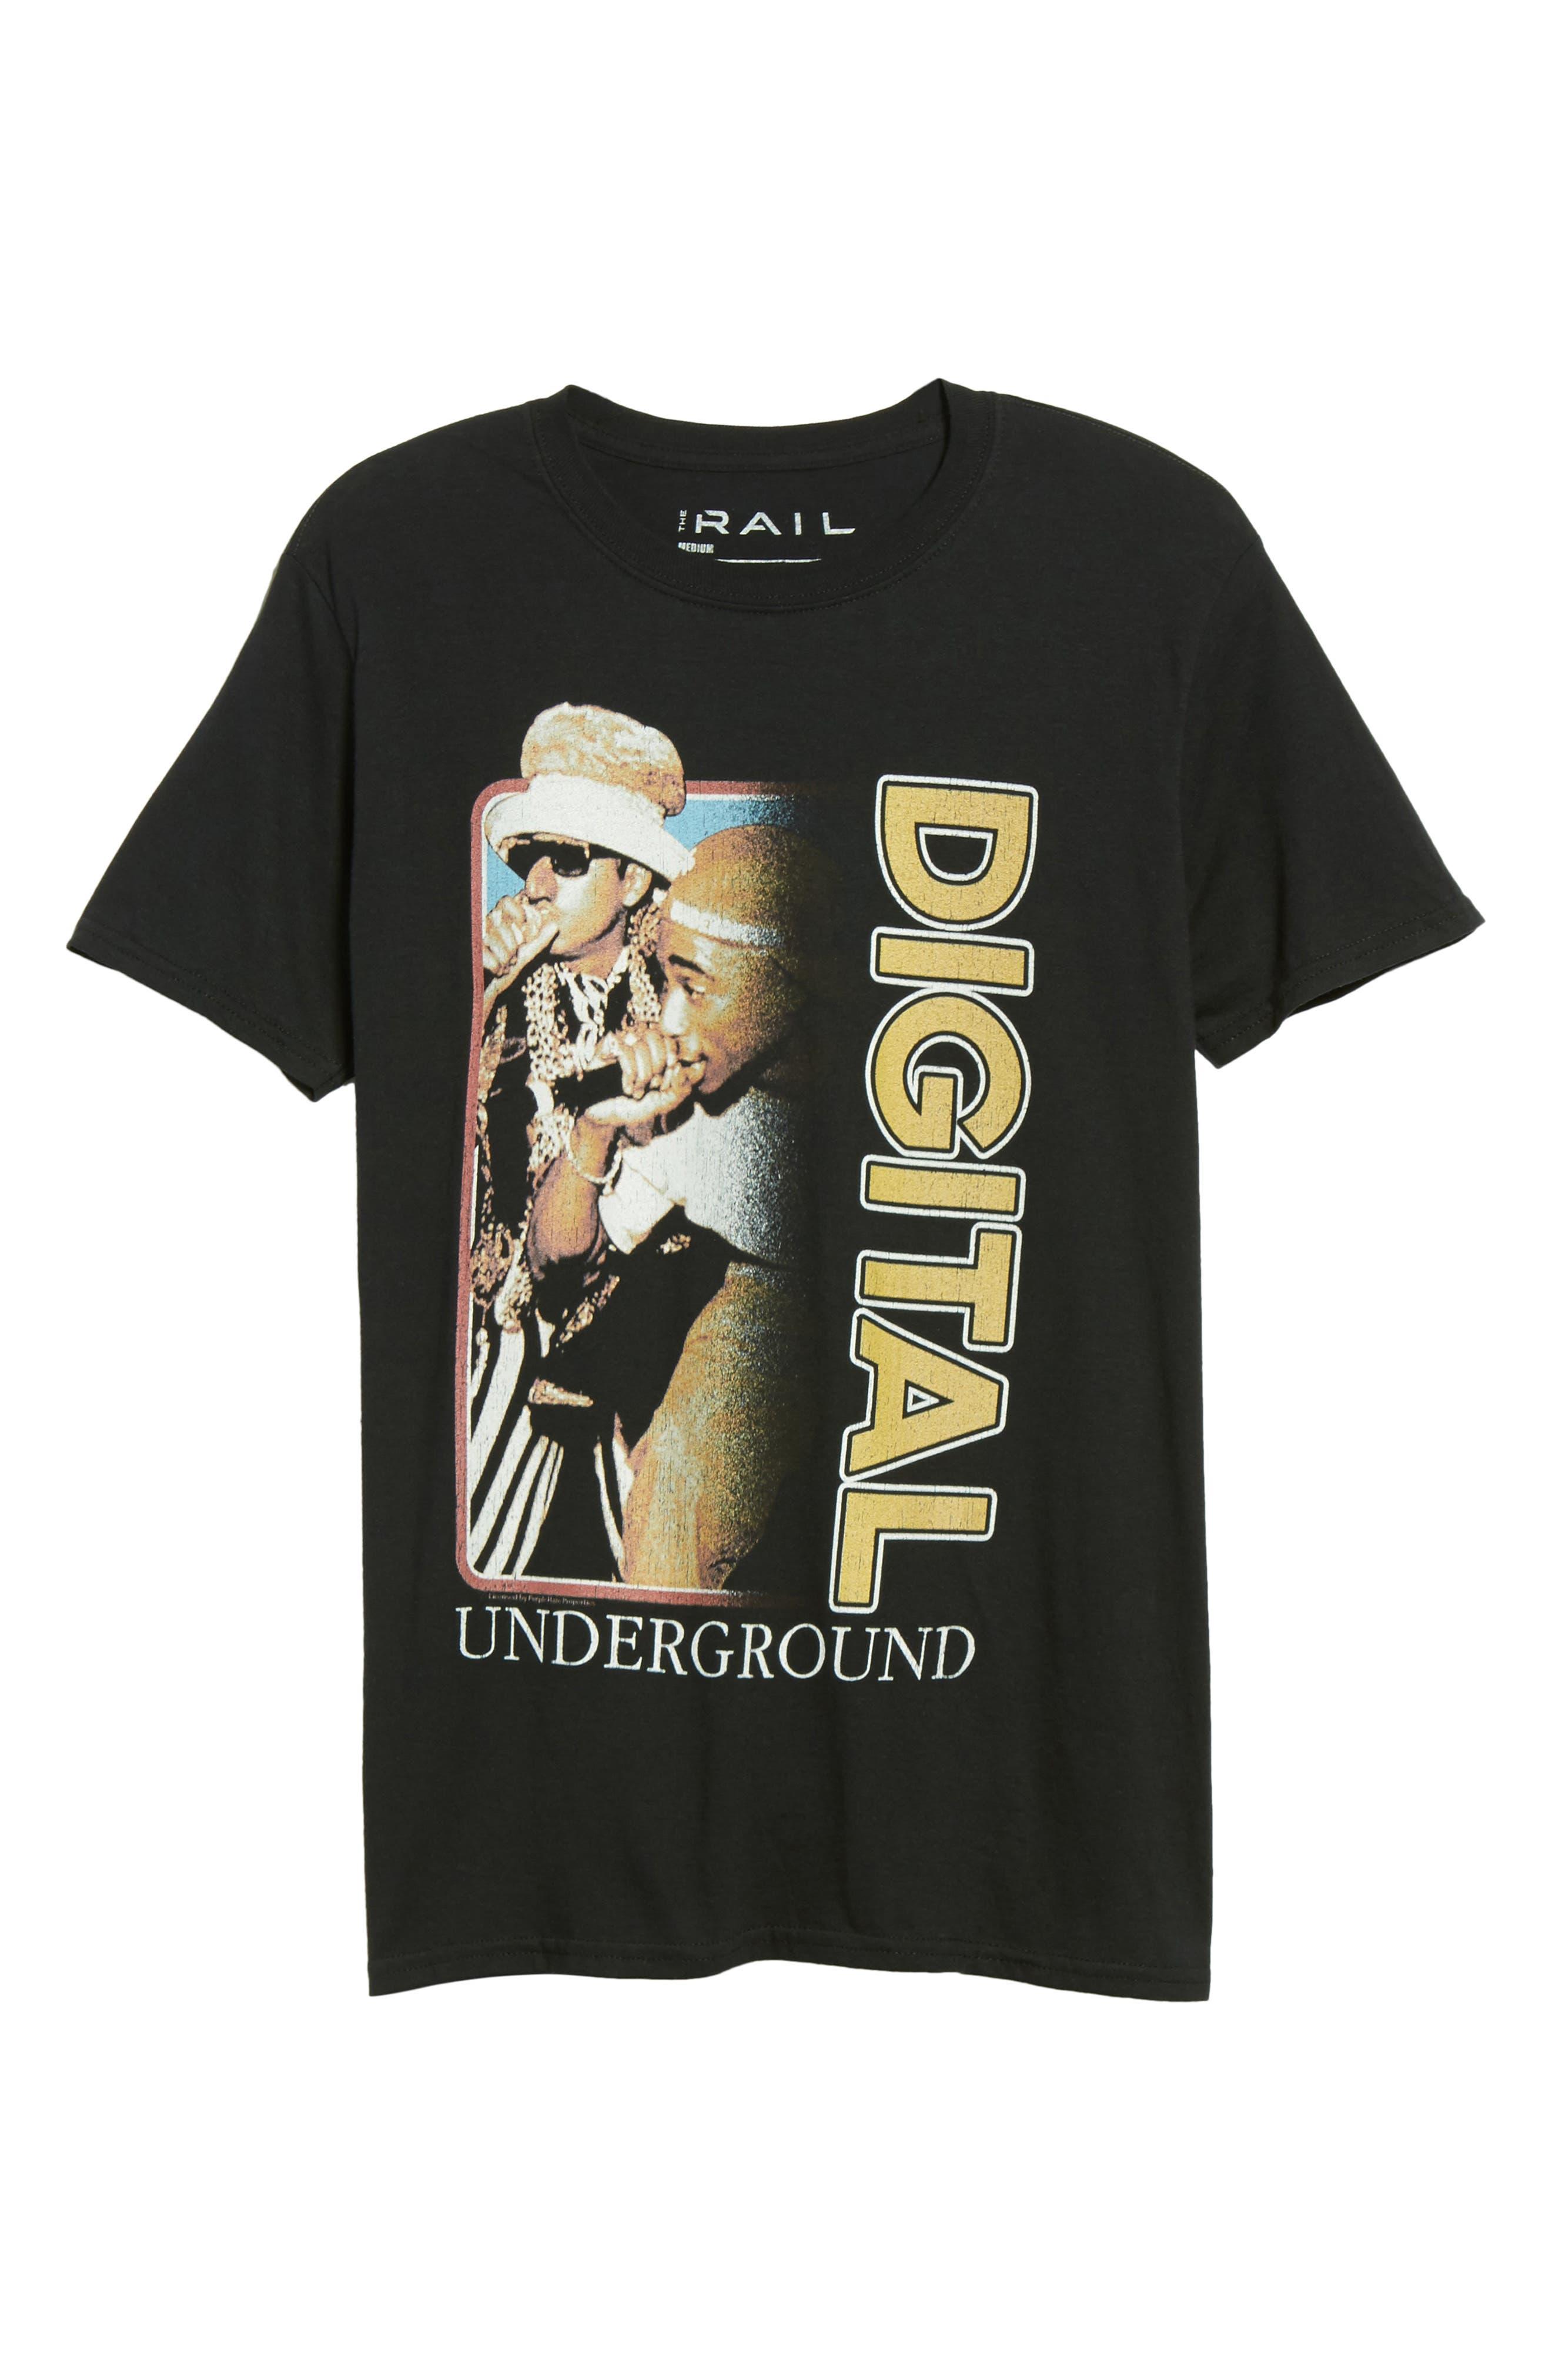 Digital Underground T-Shirt,                             Alternate thumbnail 6, color,                             Black Digital Underground